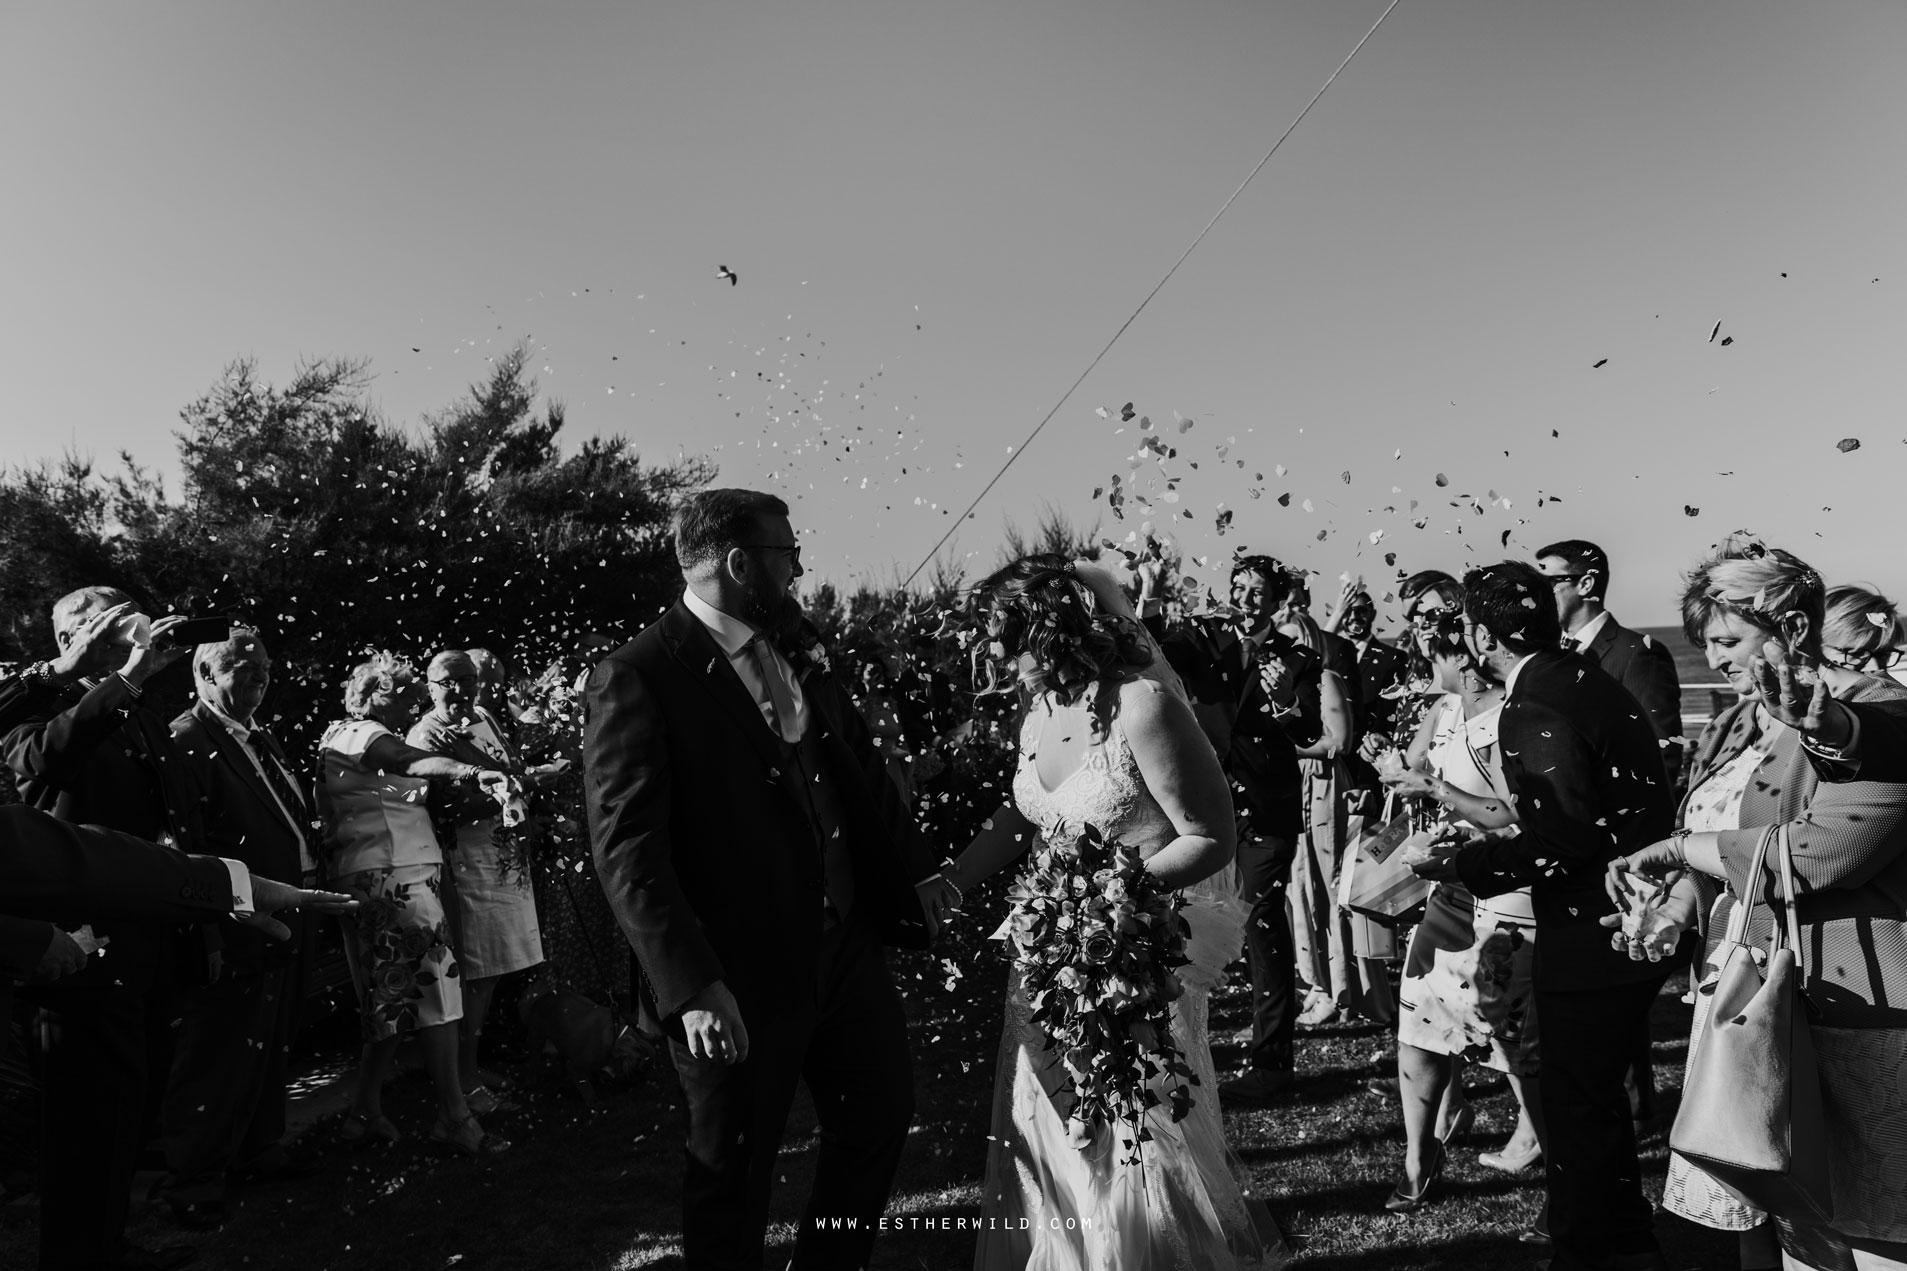 Cromer_Wedding_Beach_Outdoor_Ceremony_Norfolk_North_Lodge_Registry_Office_Rocket_House_Cafe_Cromer_Pier_IMG_4137-2.jpg